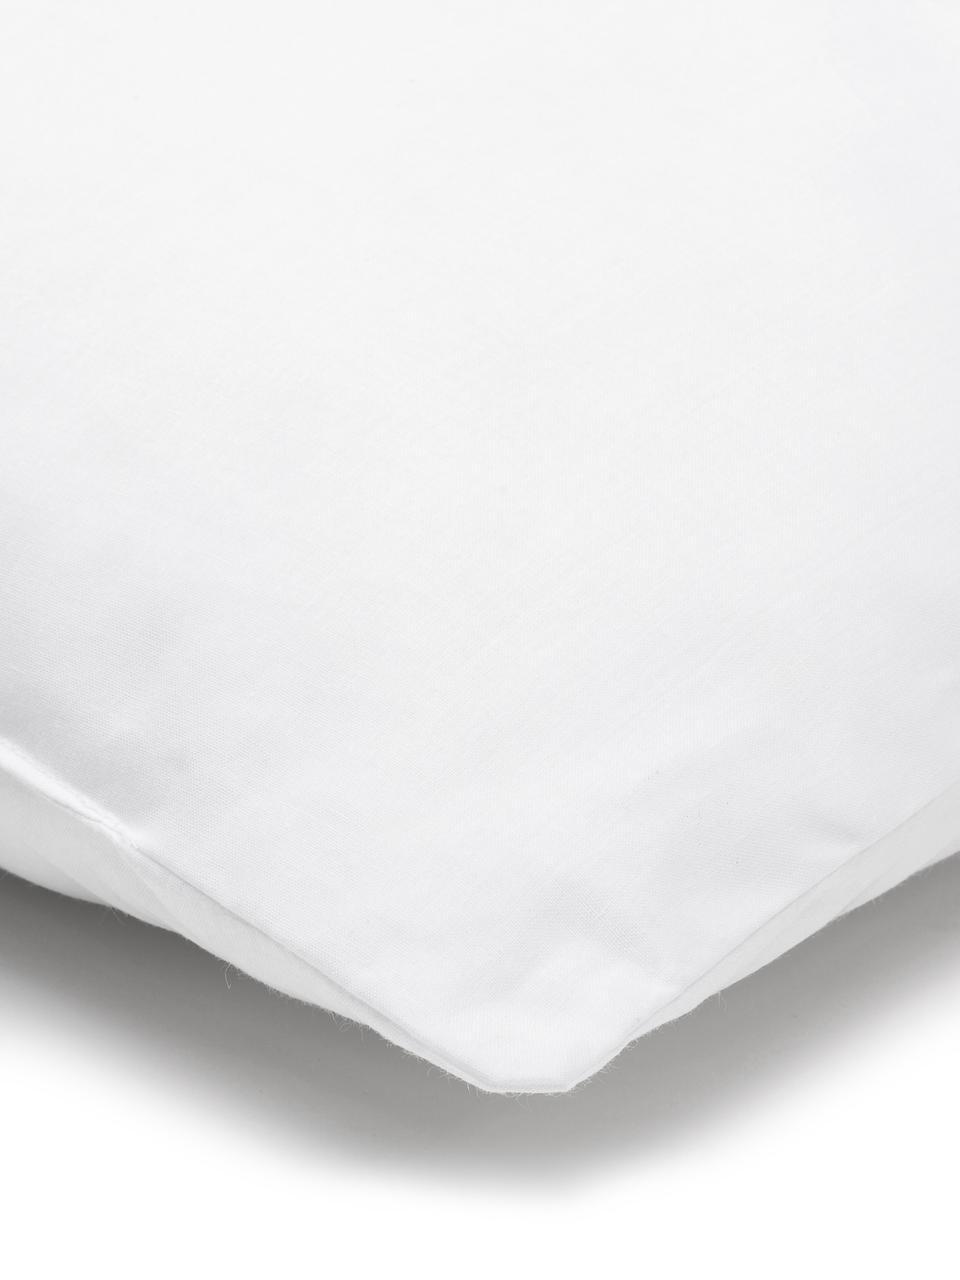 Microfiber kussenvulling Sia, 40 x 60 cm, Wit, 40 x 60 cm